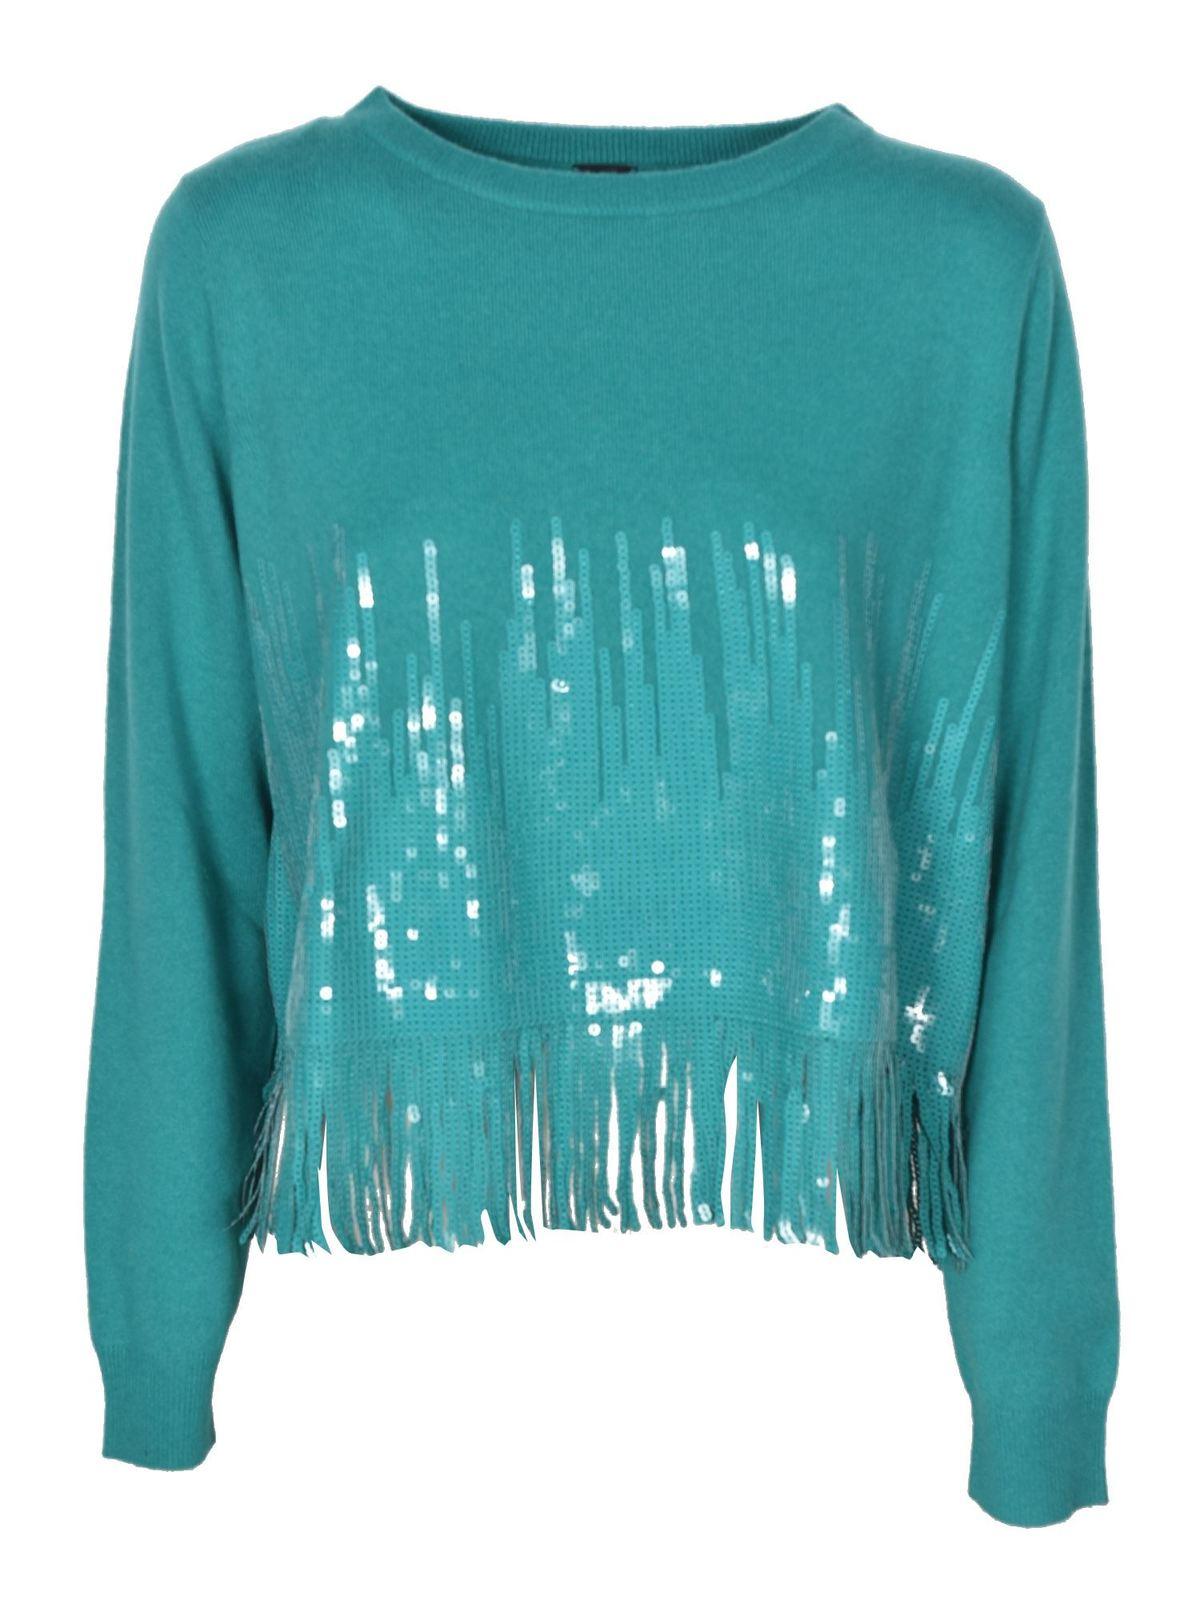 Pinko Sweaters TRIAL SWEATER IN TURQUOISE